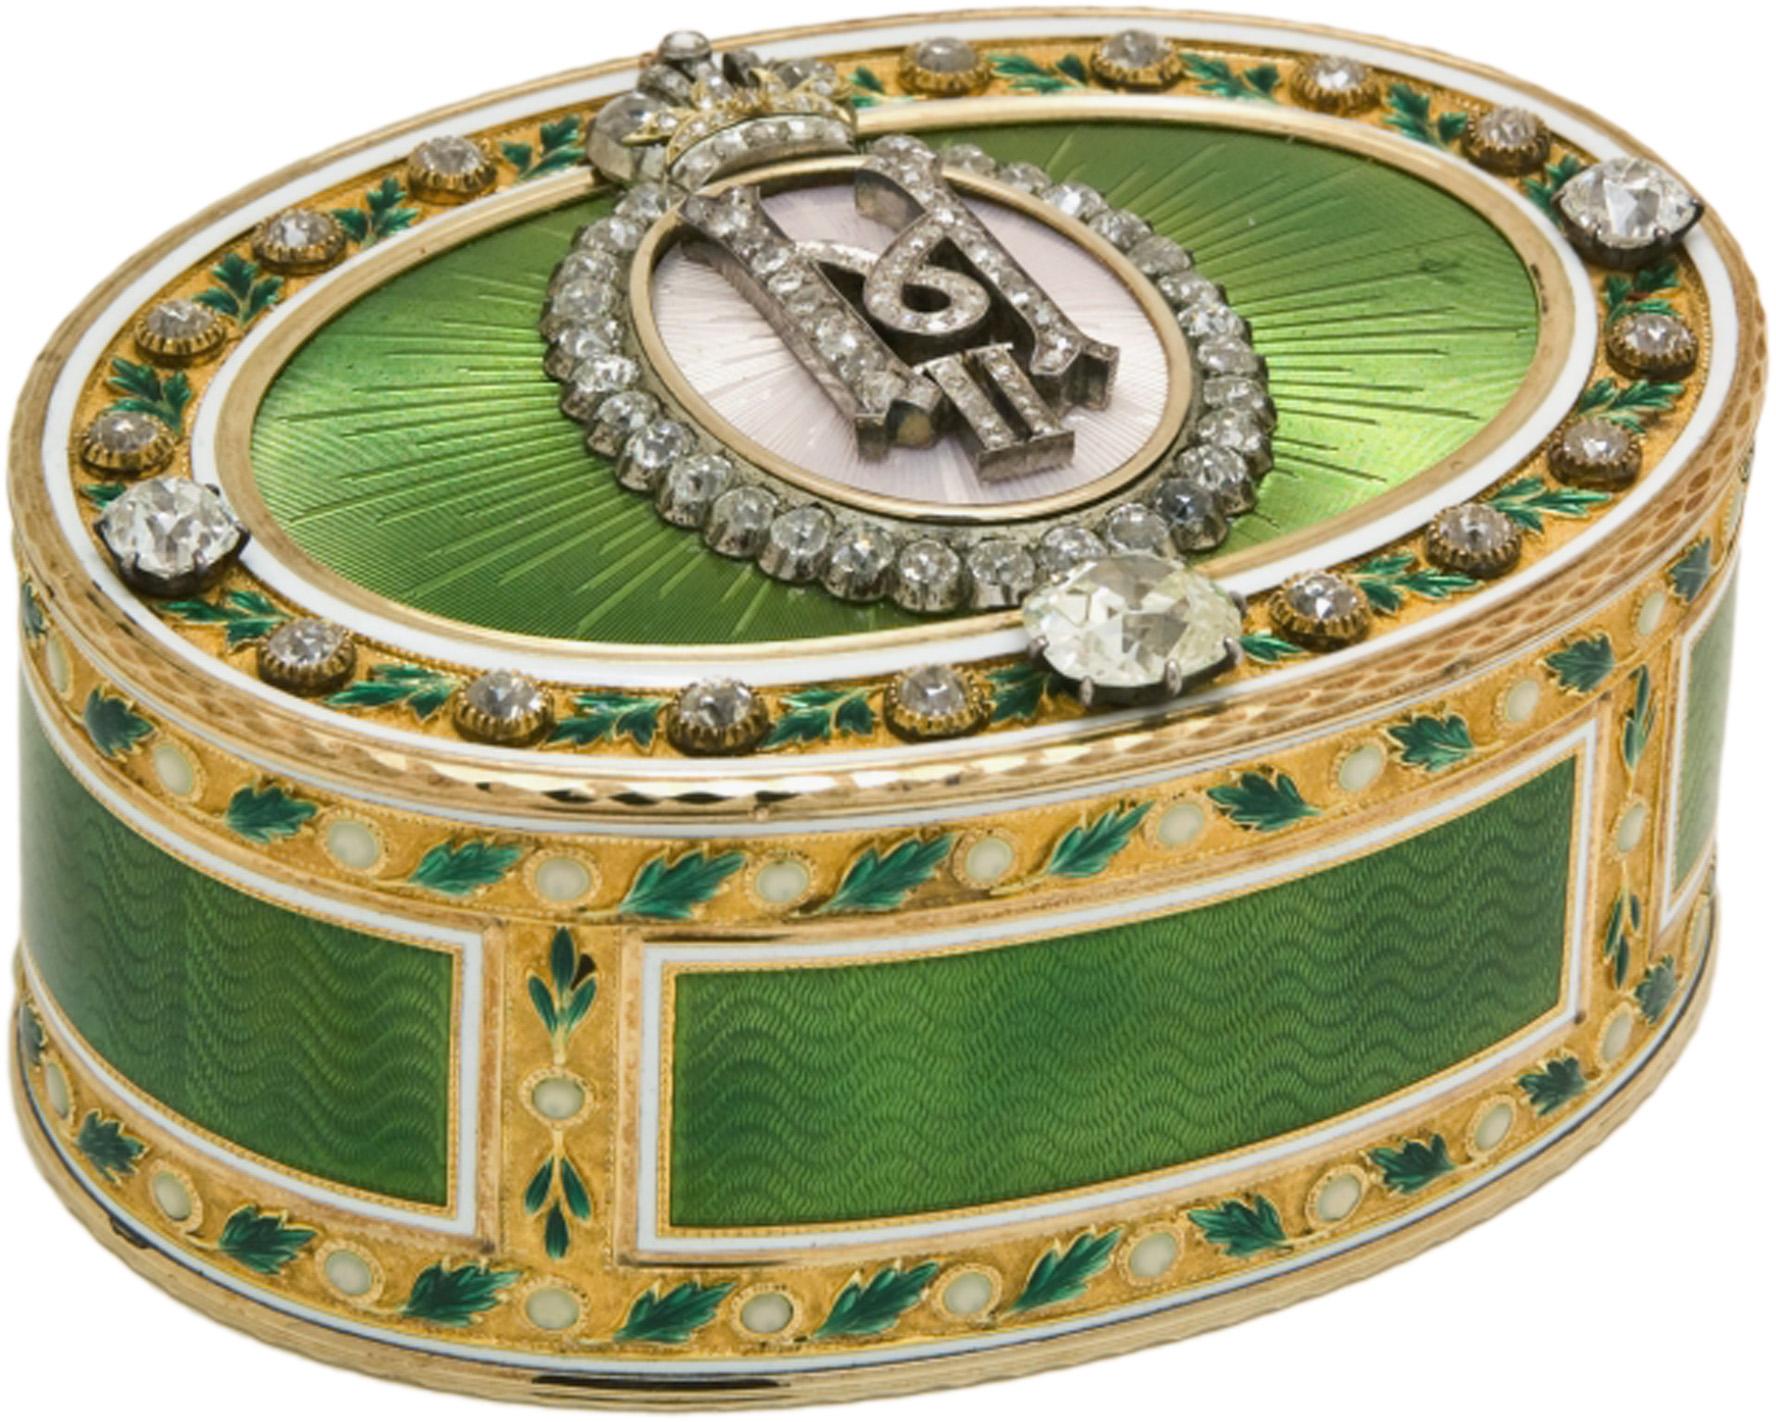 Faberge – sinonim za luksuz - Page 3 Imperial-Presentation-Box-by-Faberge-workmaster-Mikhail-Perkhin-St.-Petersburg-1899-1908.